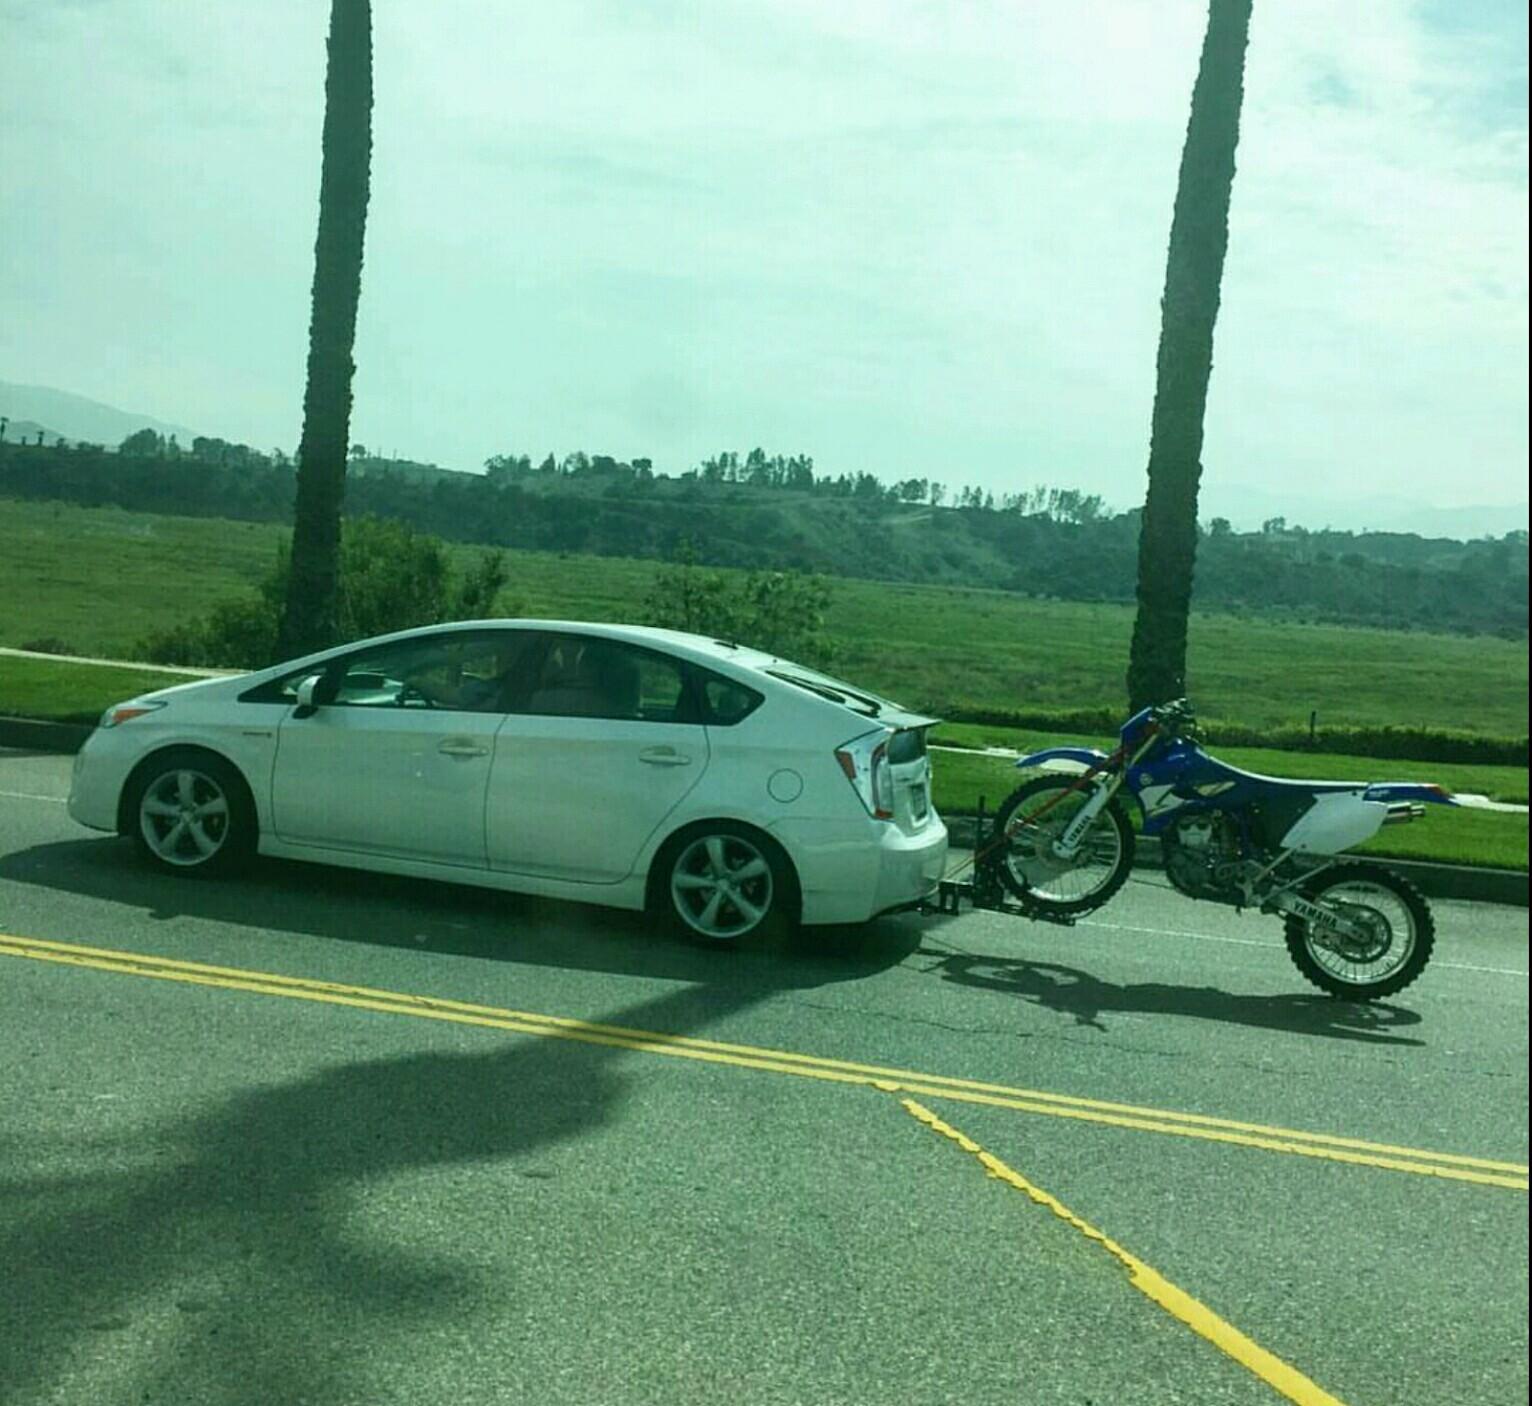 20828 - rubarb - Motocross Pictures - Vital MX